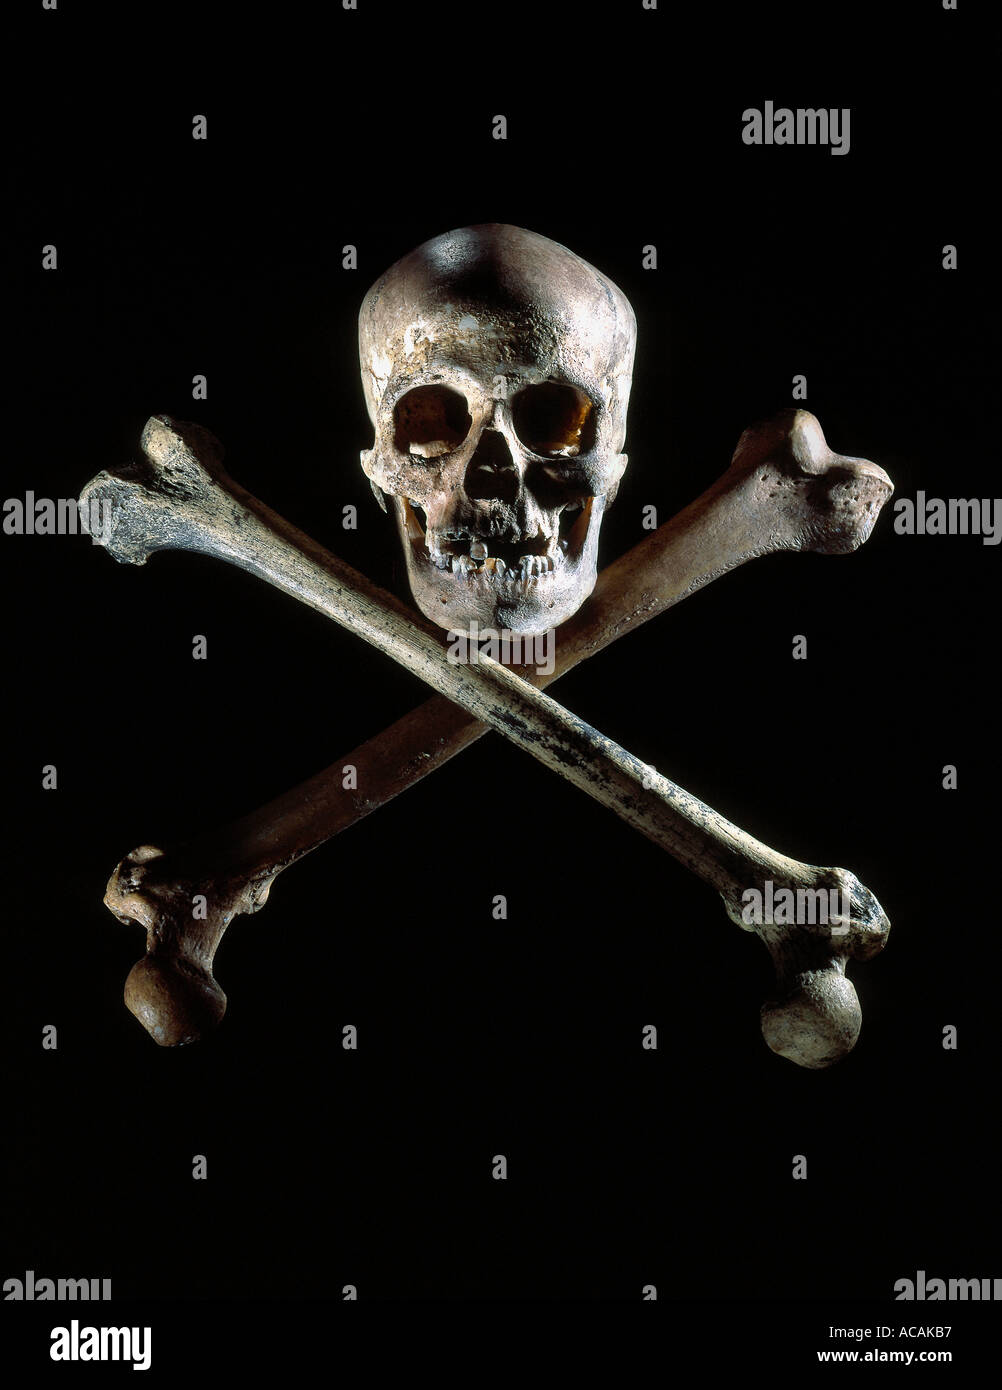 Skull Crossbones on black background - Stock Image